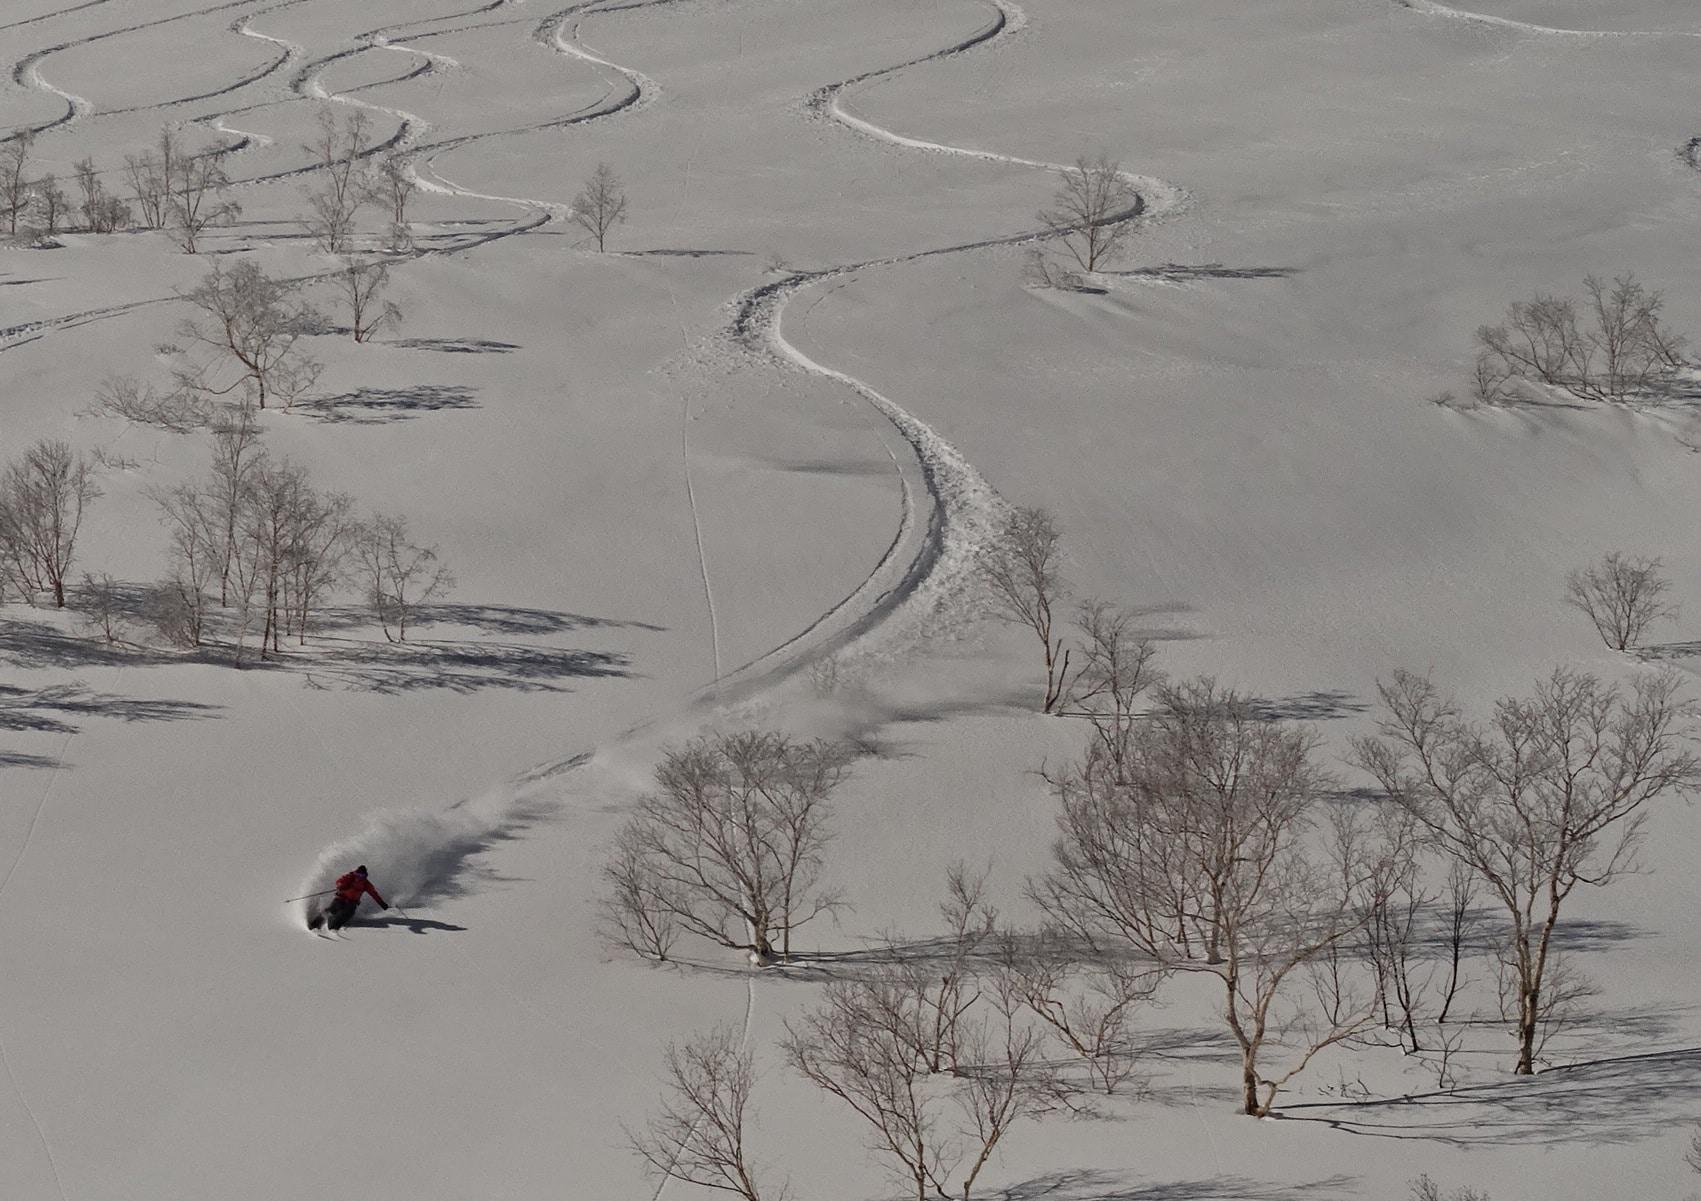 Hokkaido Powder Hunting